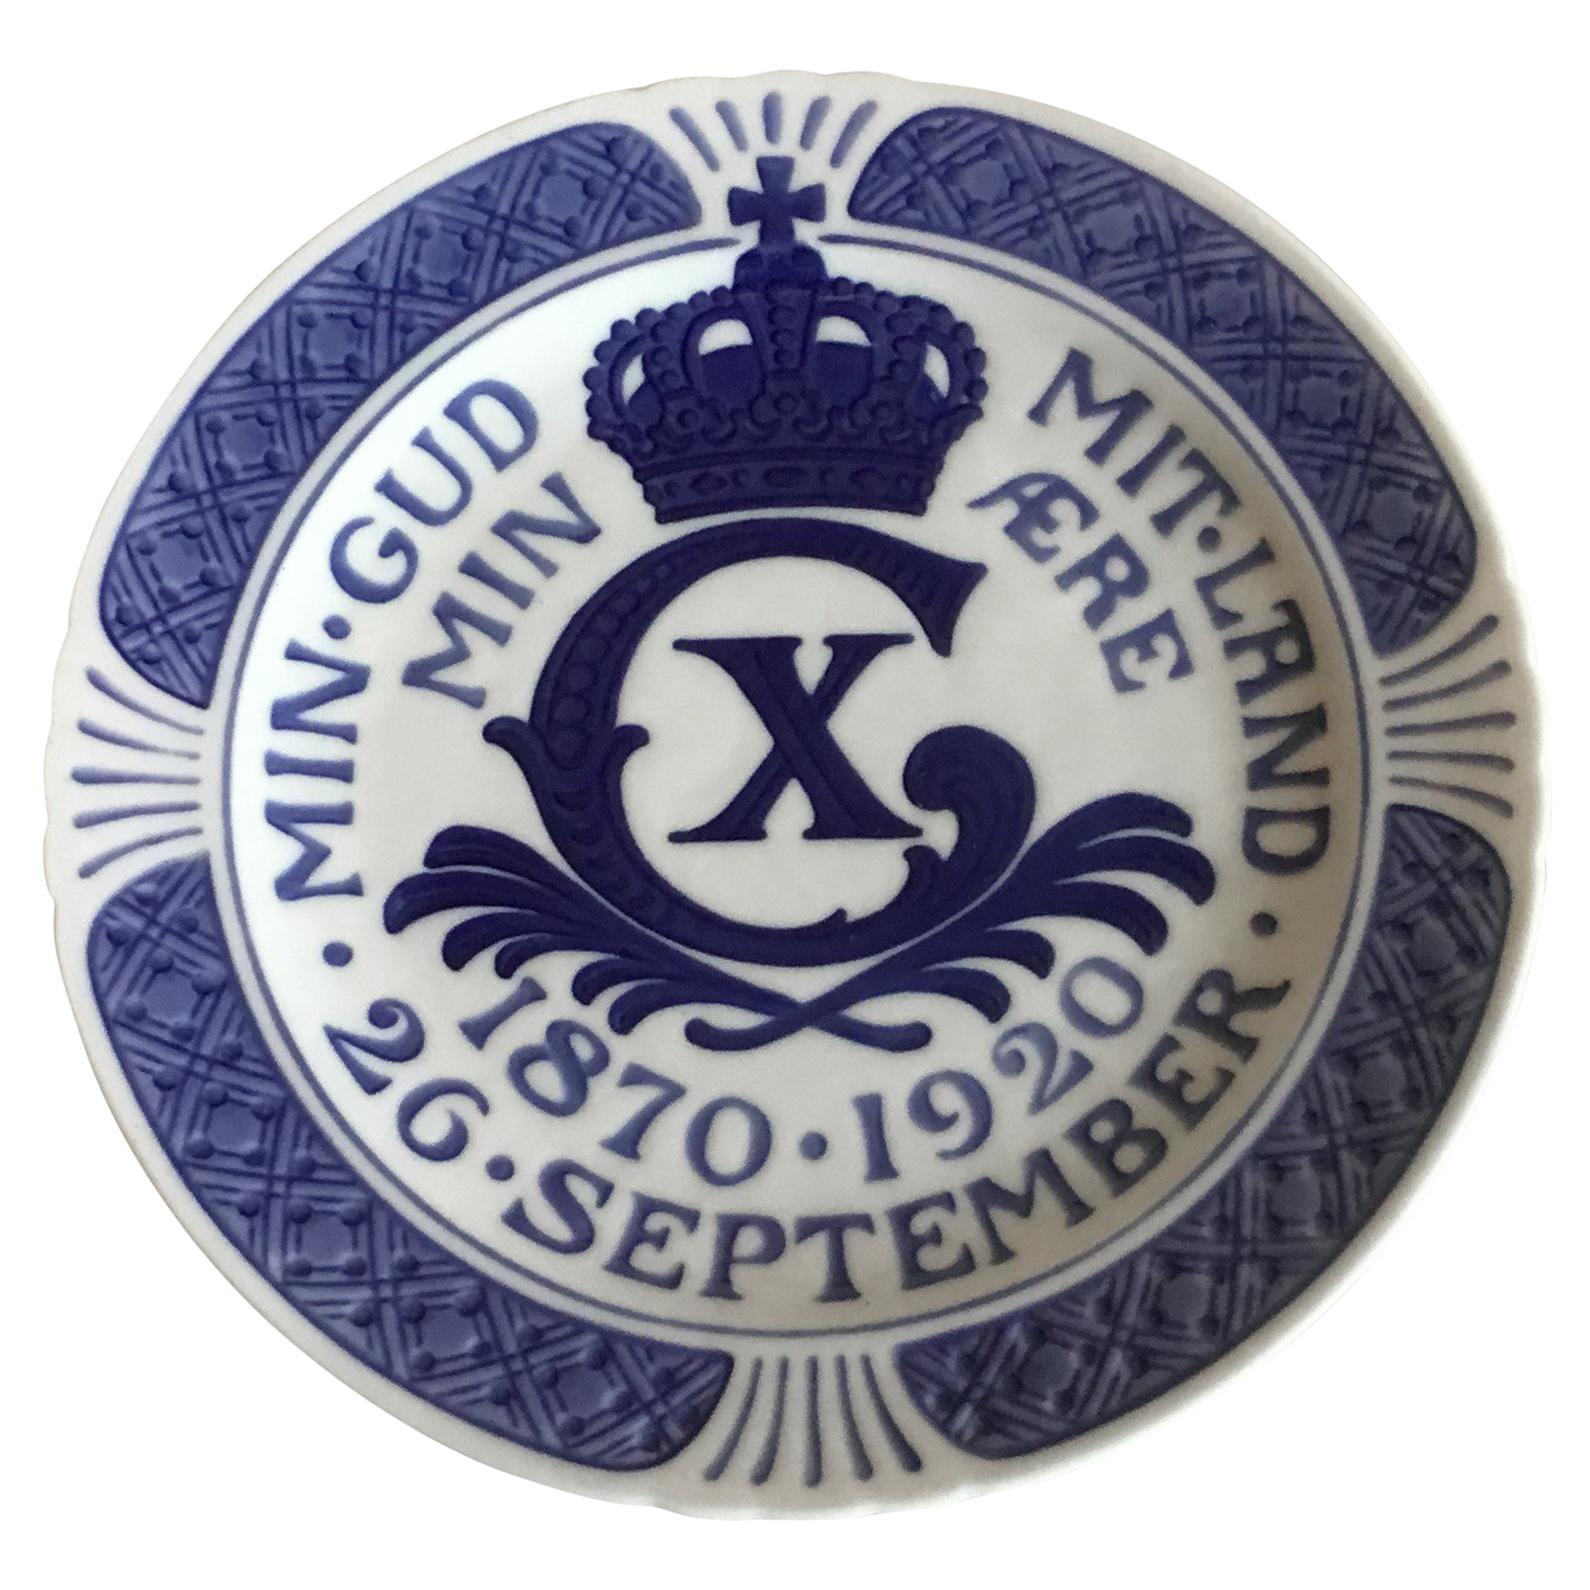 Royal Copenhagen Commemorative Plate from 1920 RC-CM195